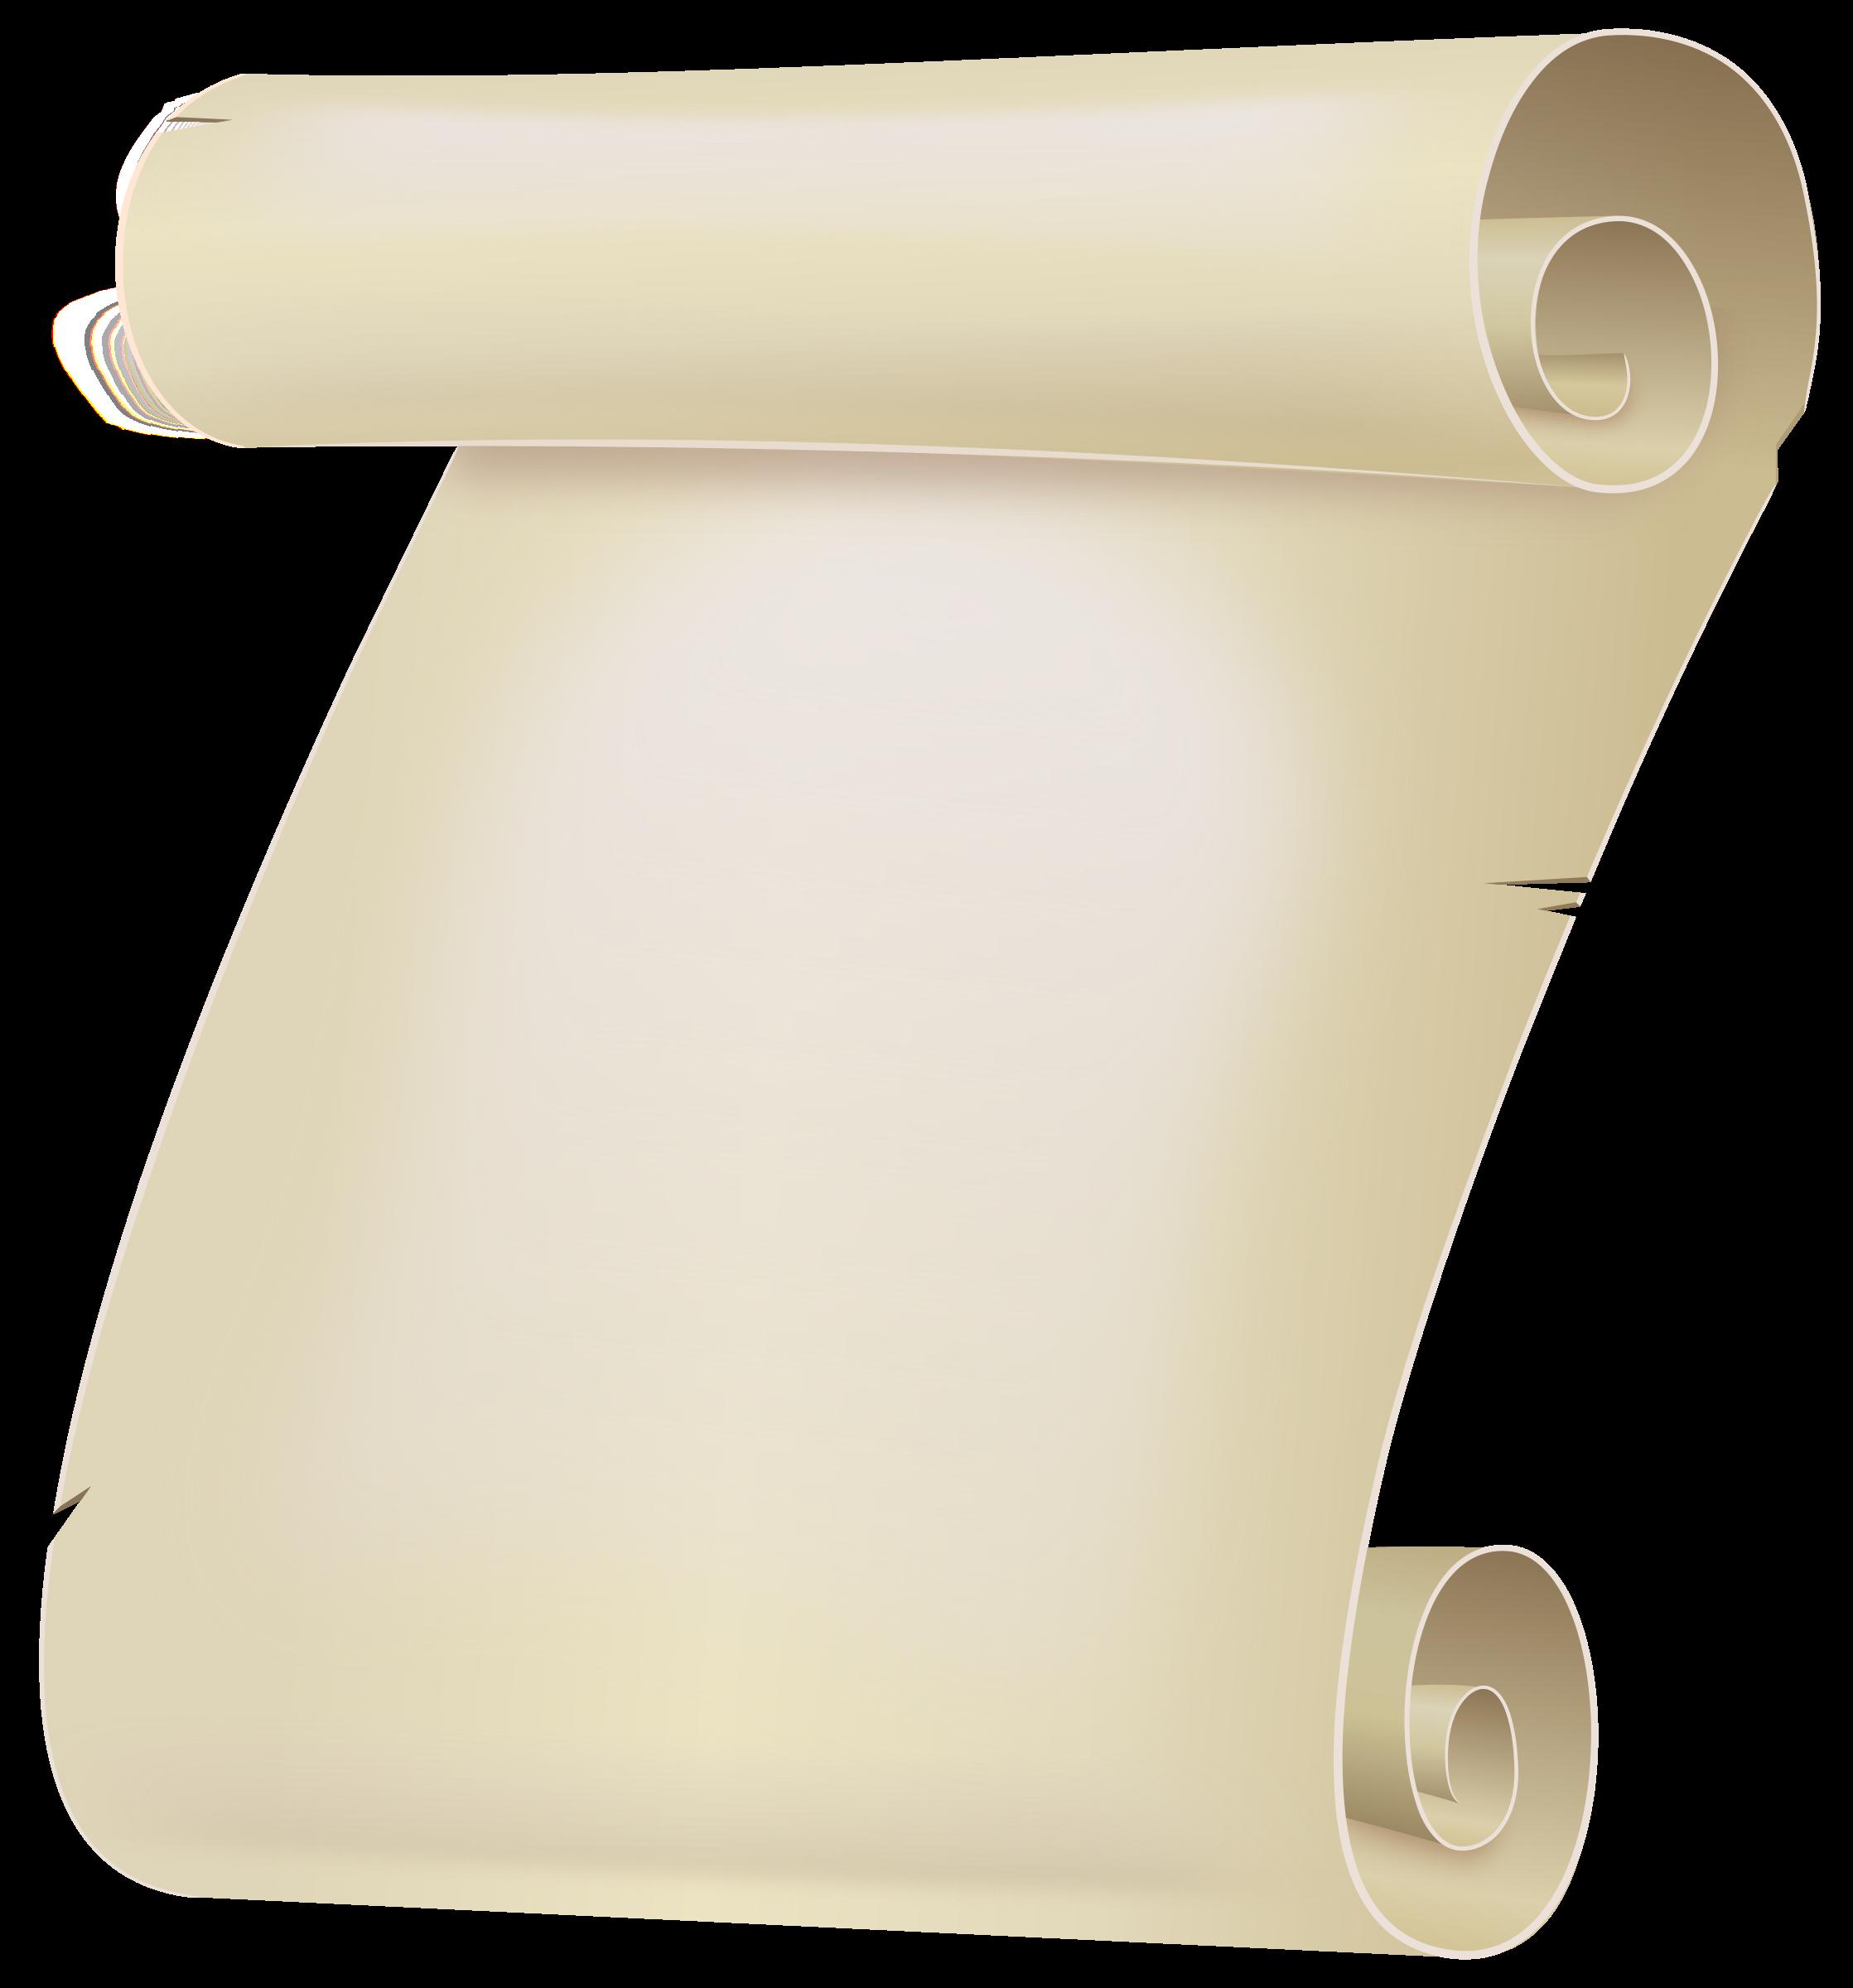 Scroll clipart small scroll.